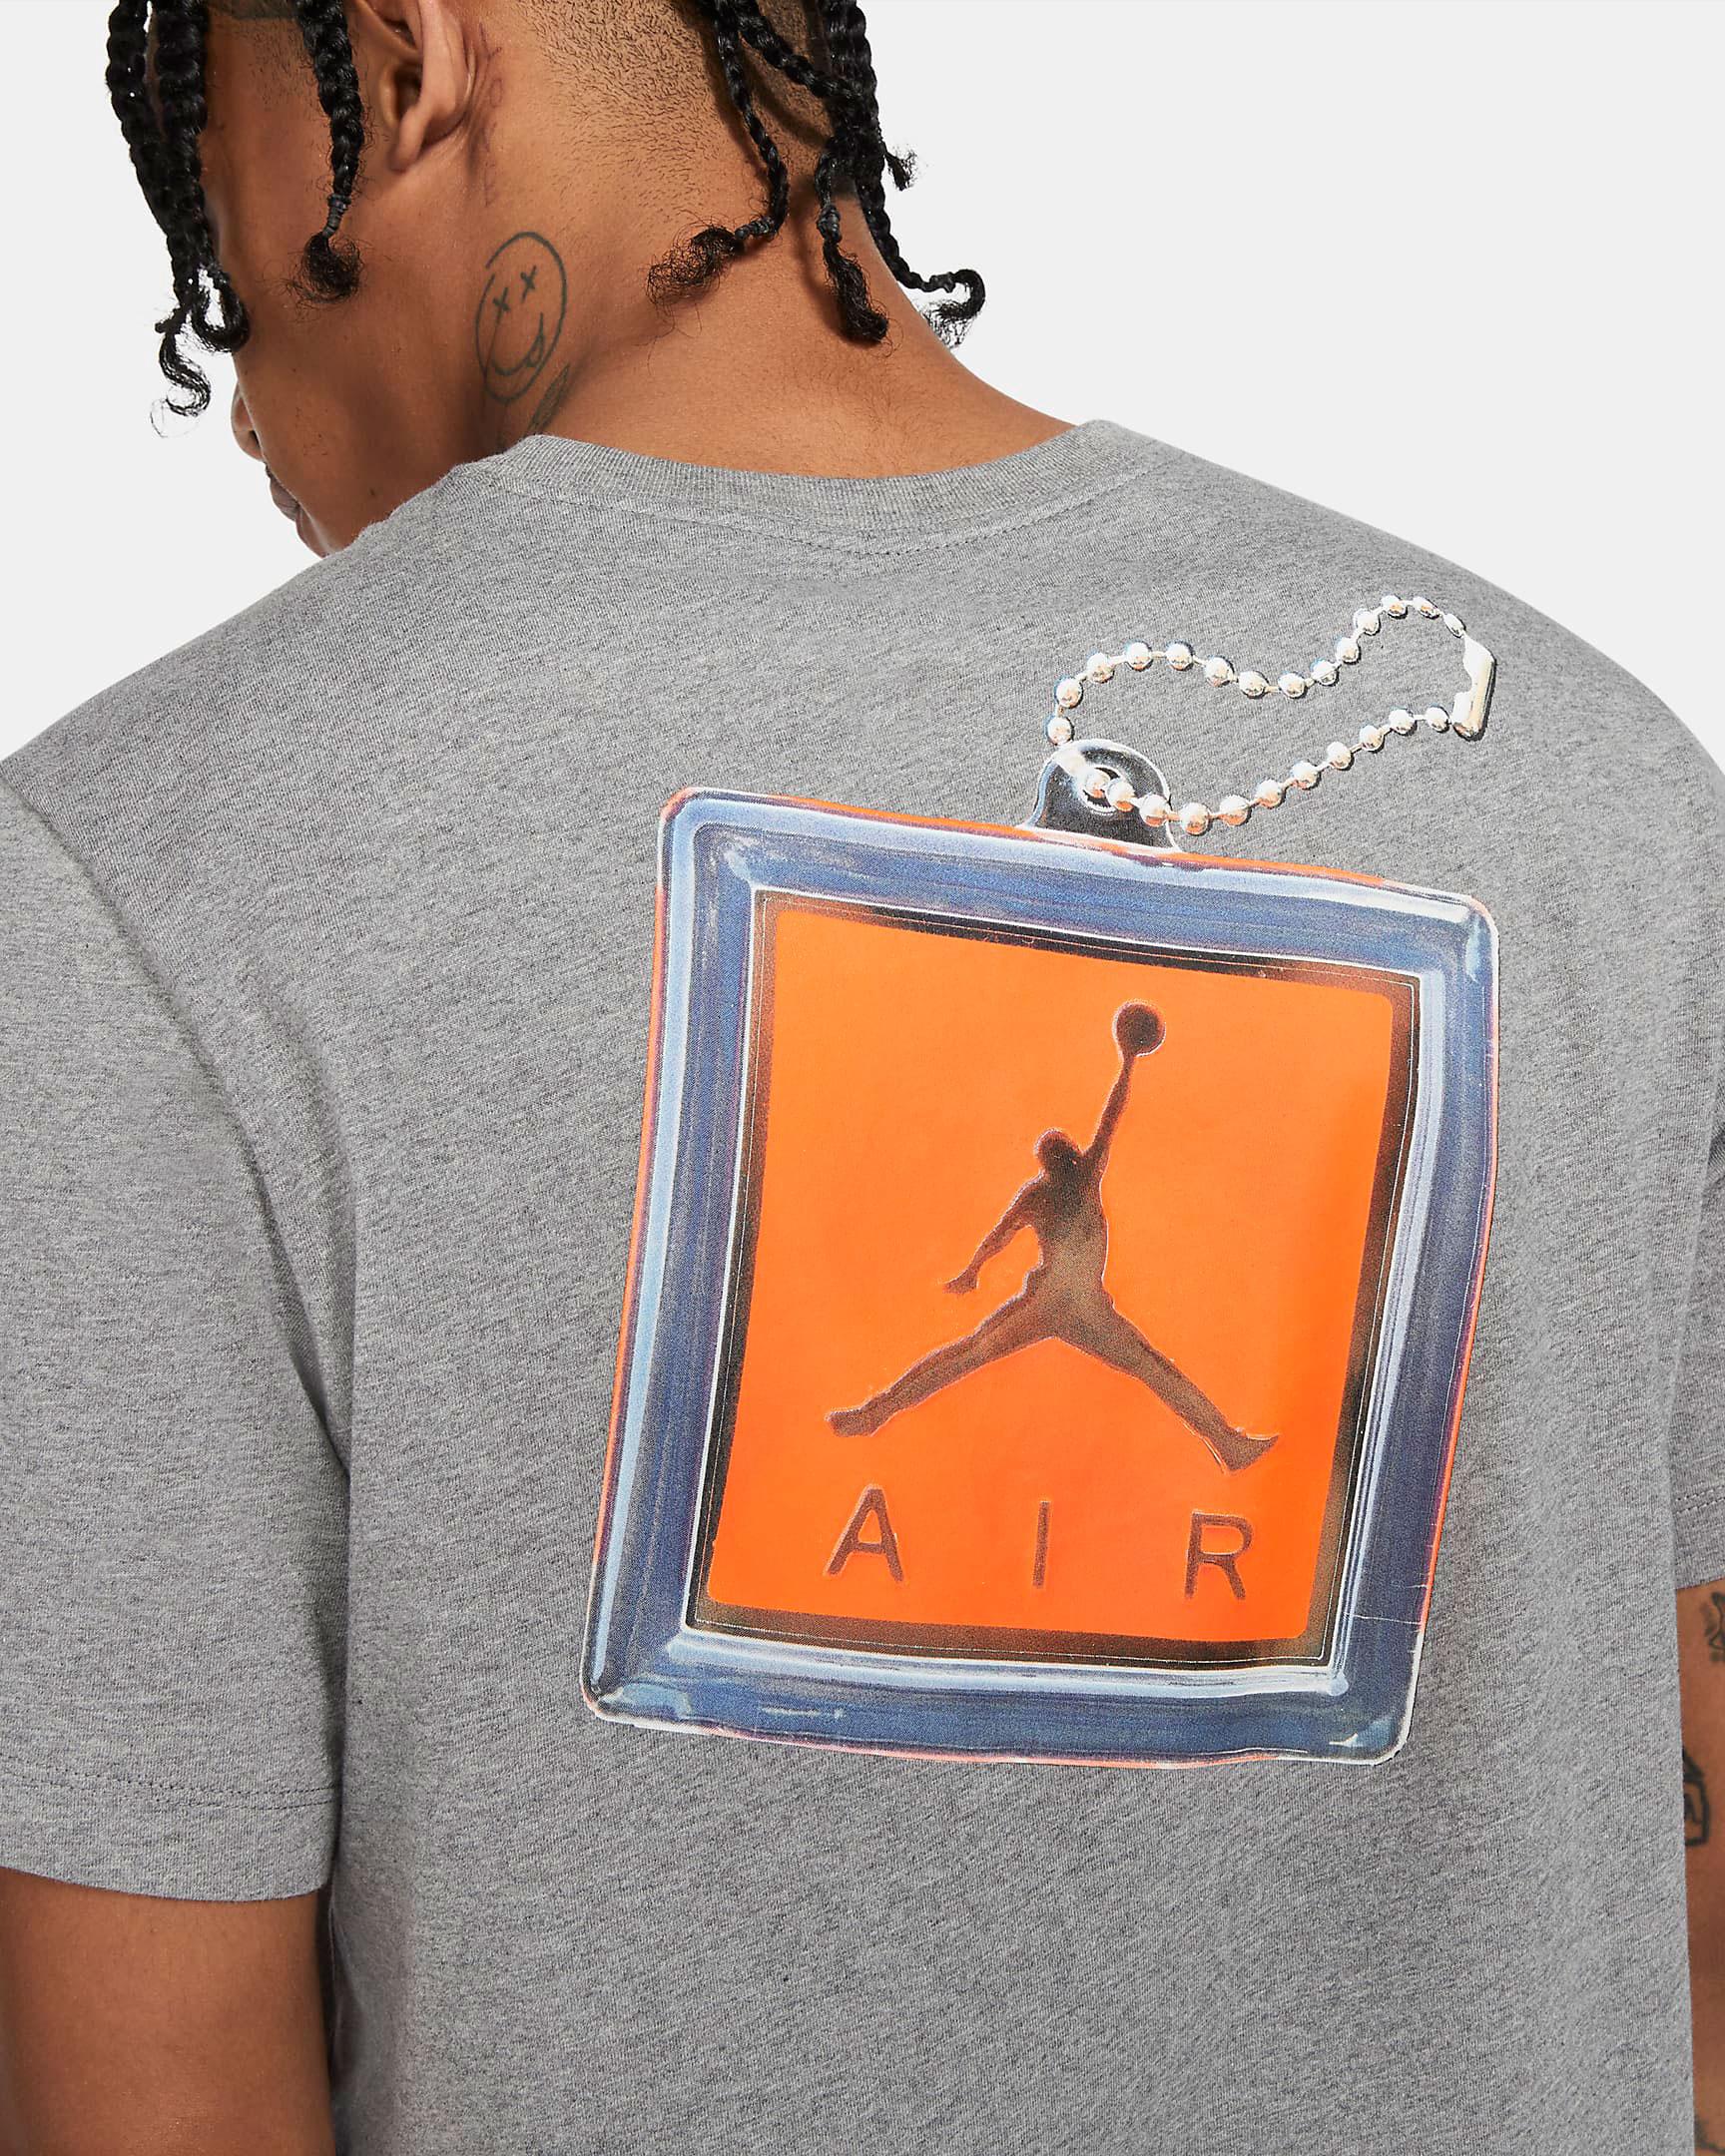 jordan-keychain-shirt-grey-orange-4